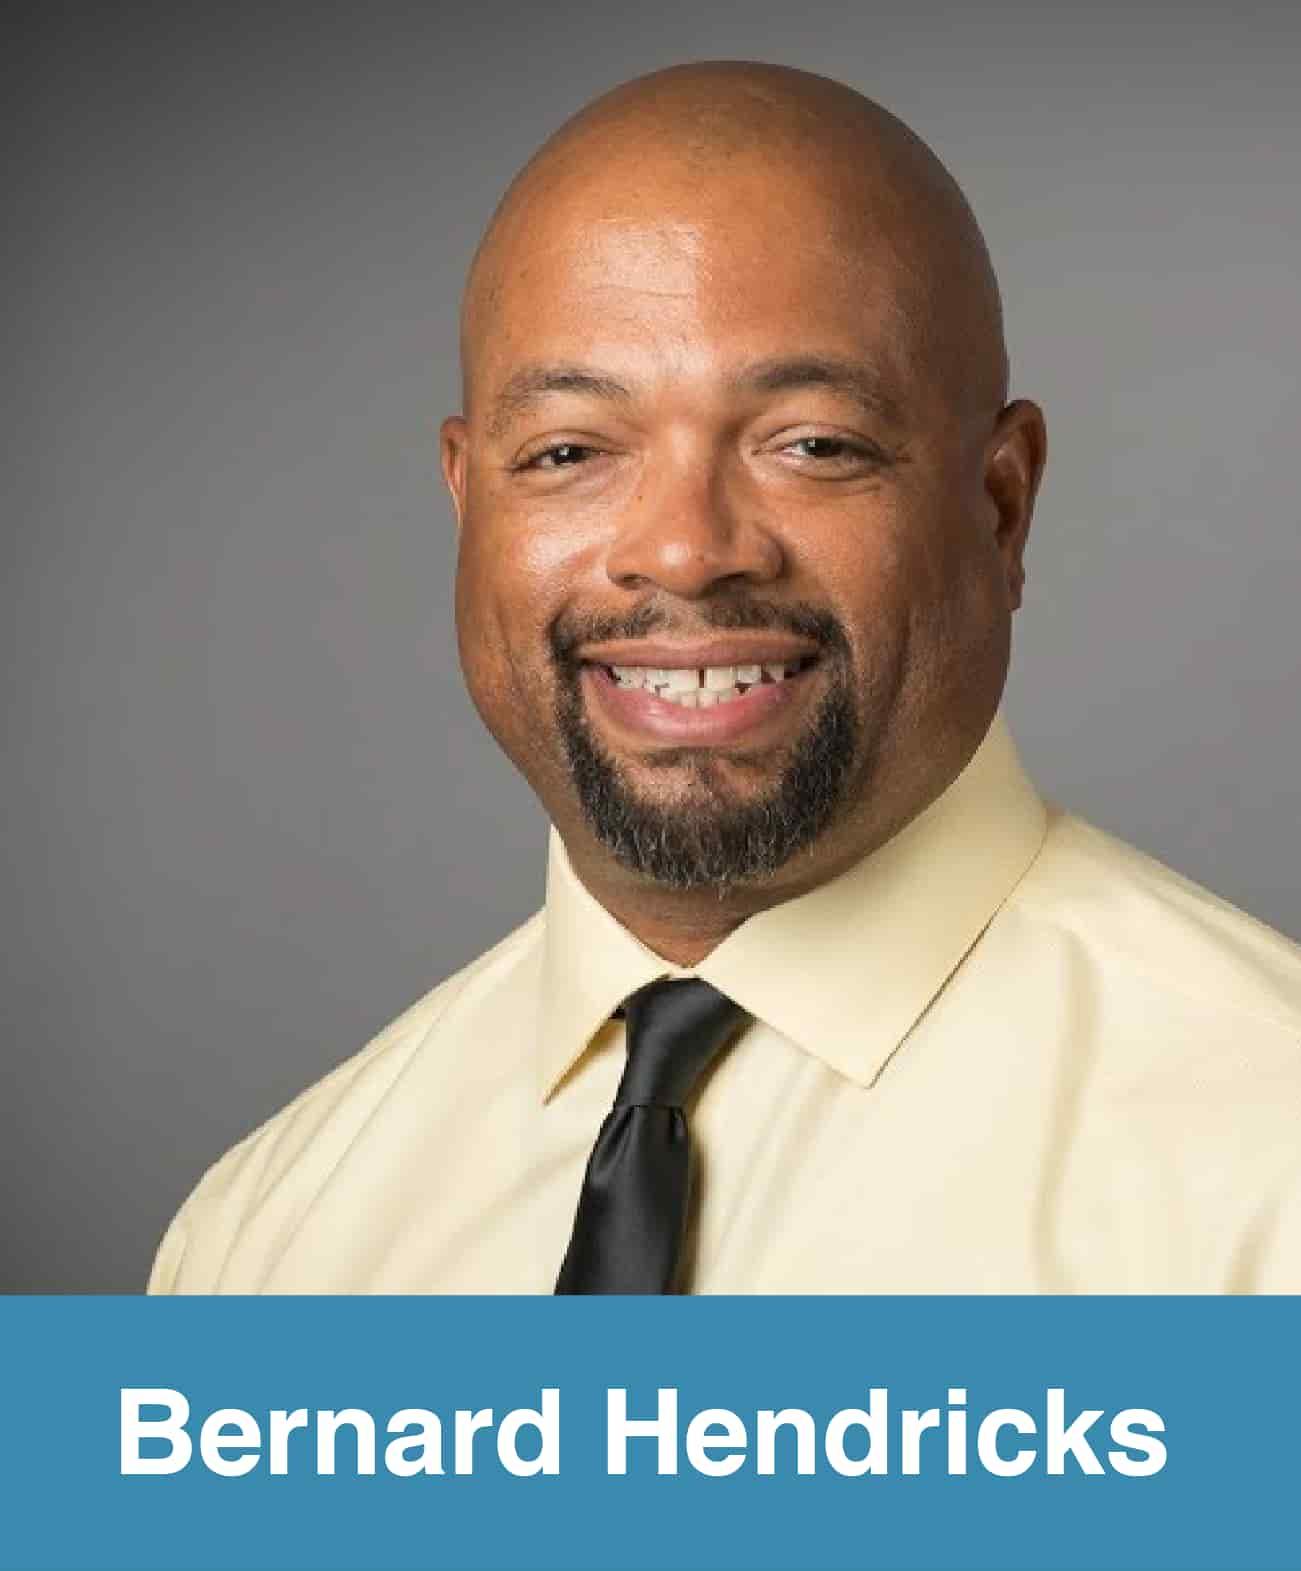 Bernard Hendricks 7 Figure Multifamily